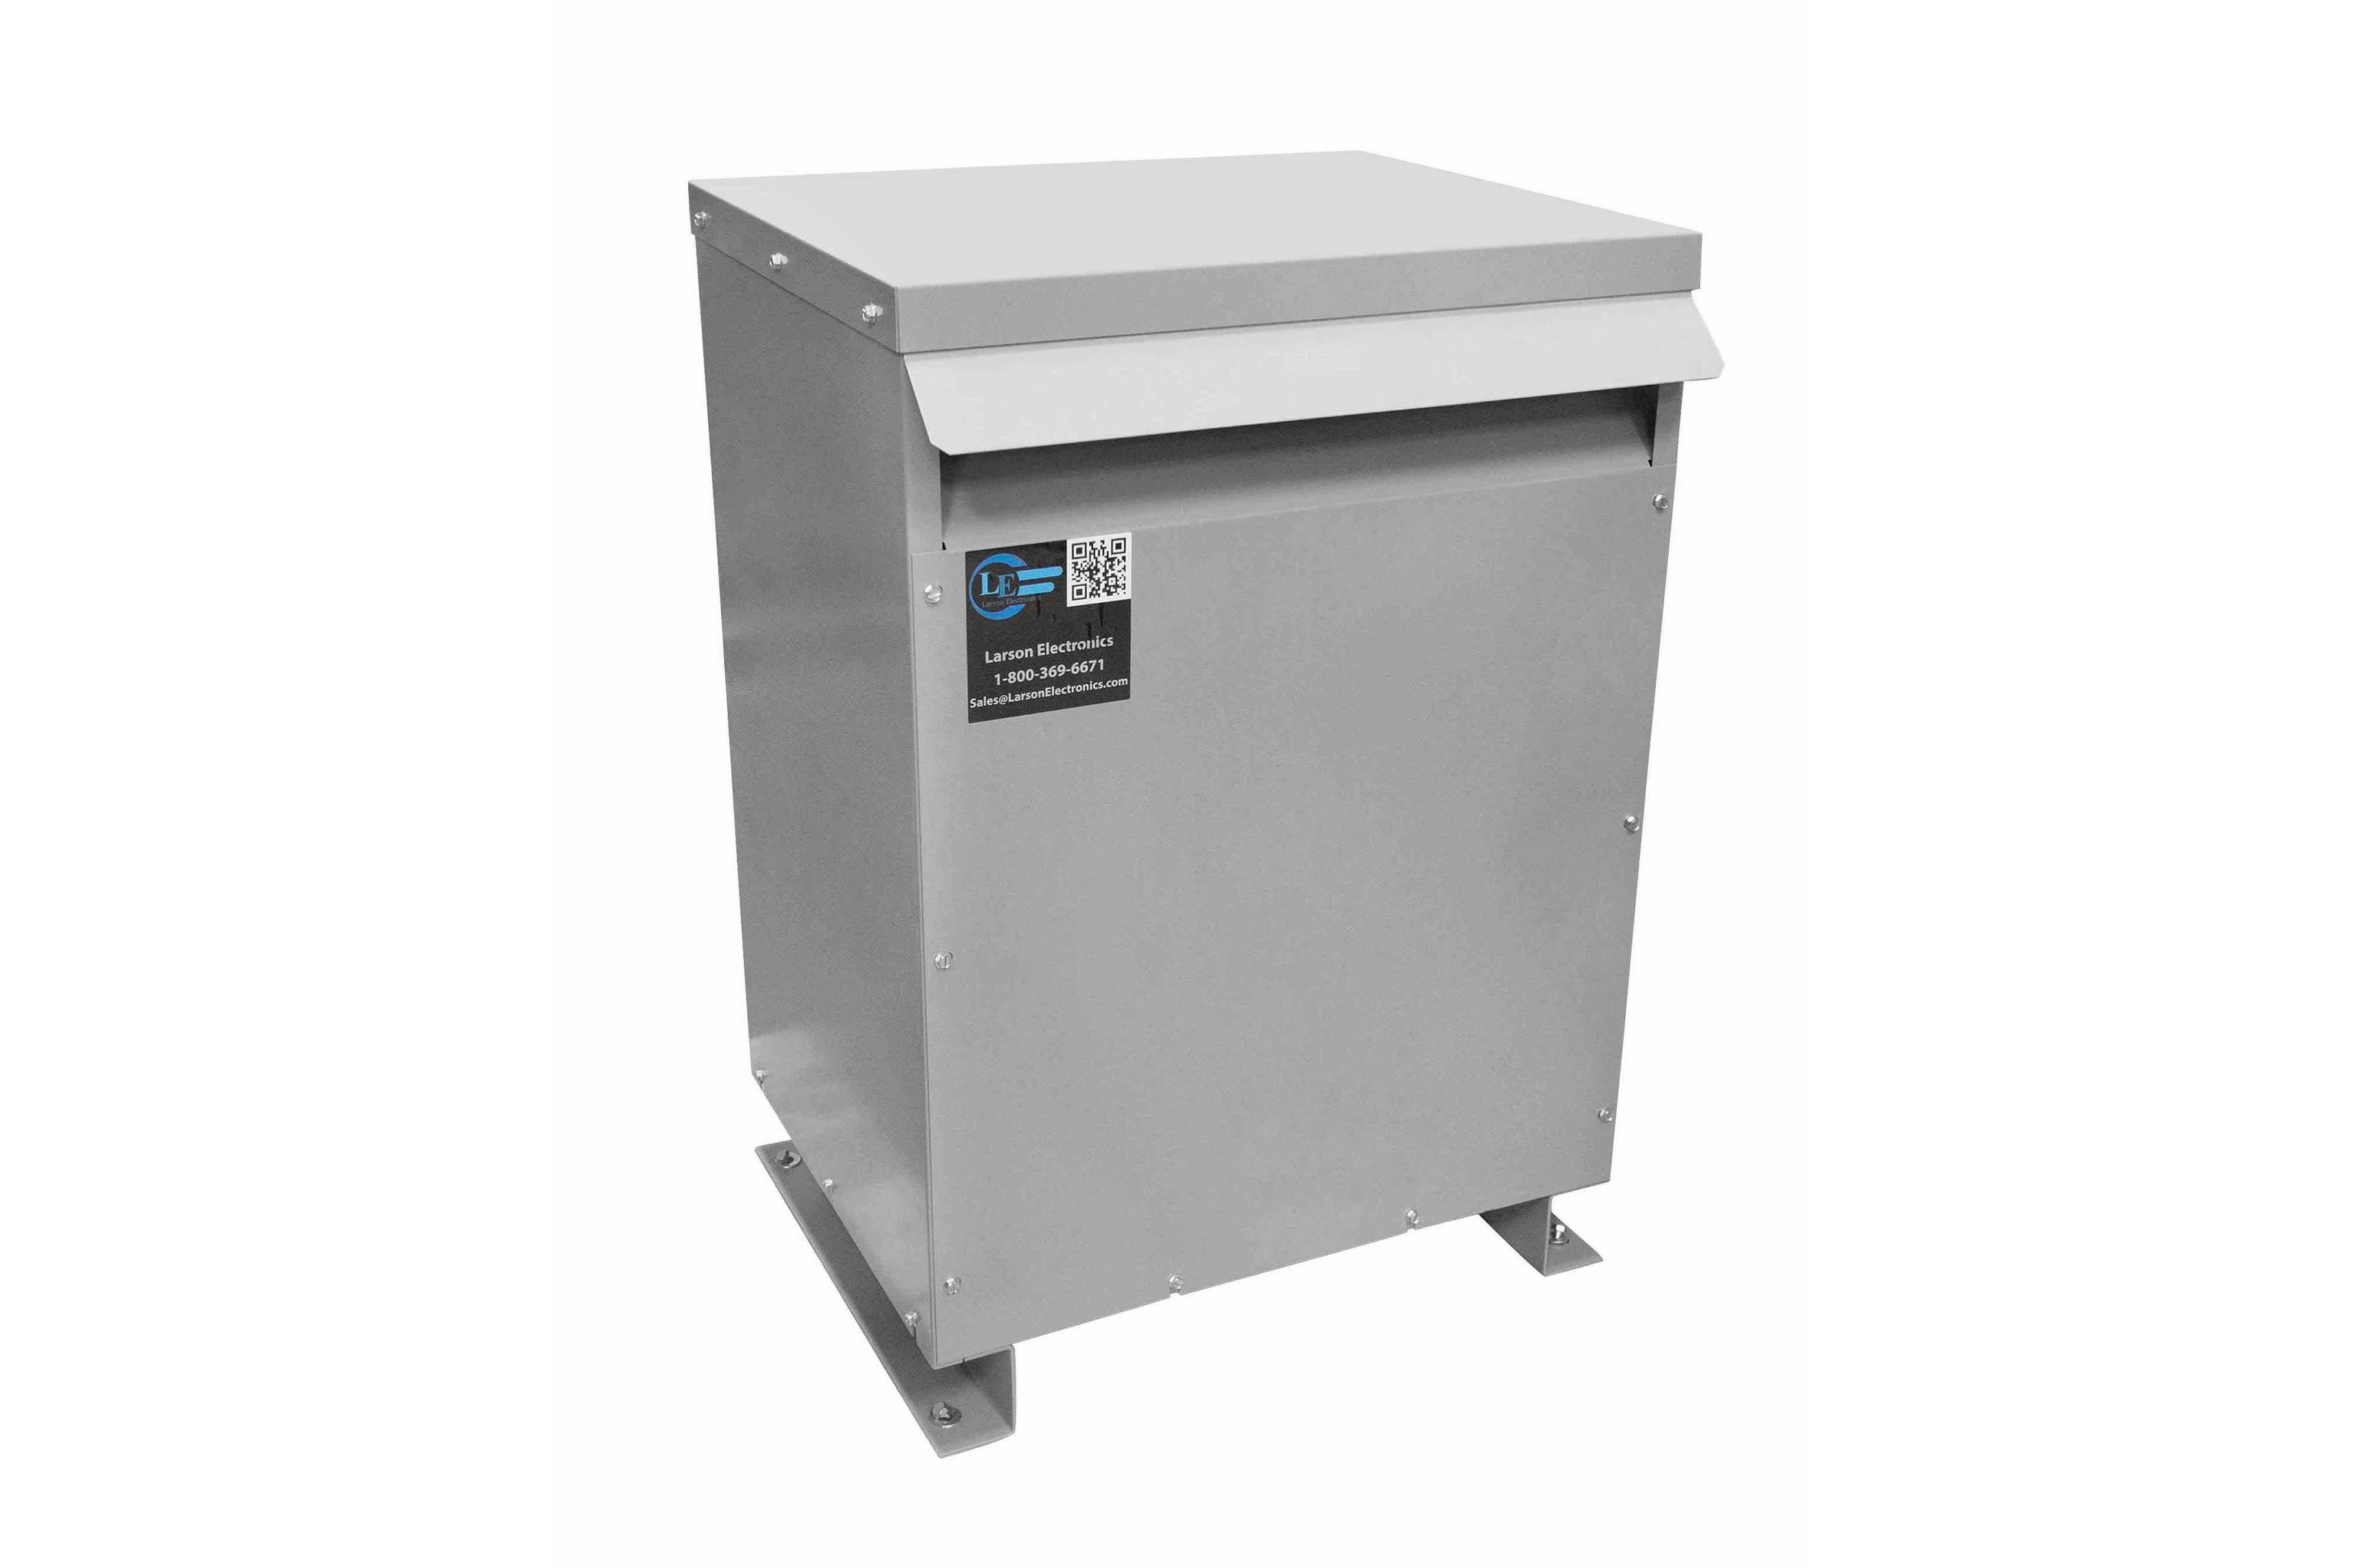 80 kVA 3PH Isolation Transformer, 240V Wye Primary, 415V Delta Secondary, N3R, Ventilated, 60 Hz